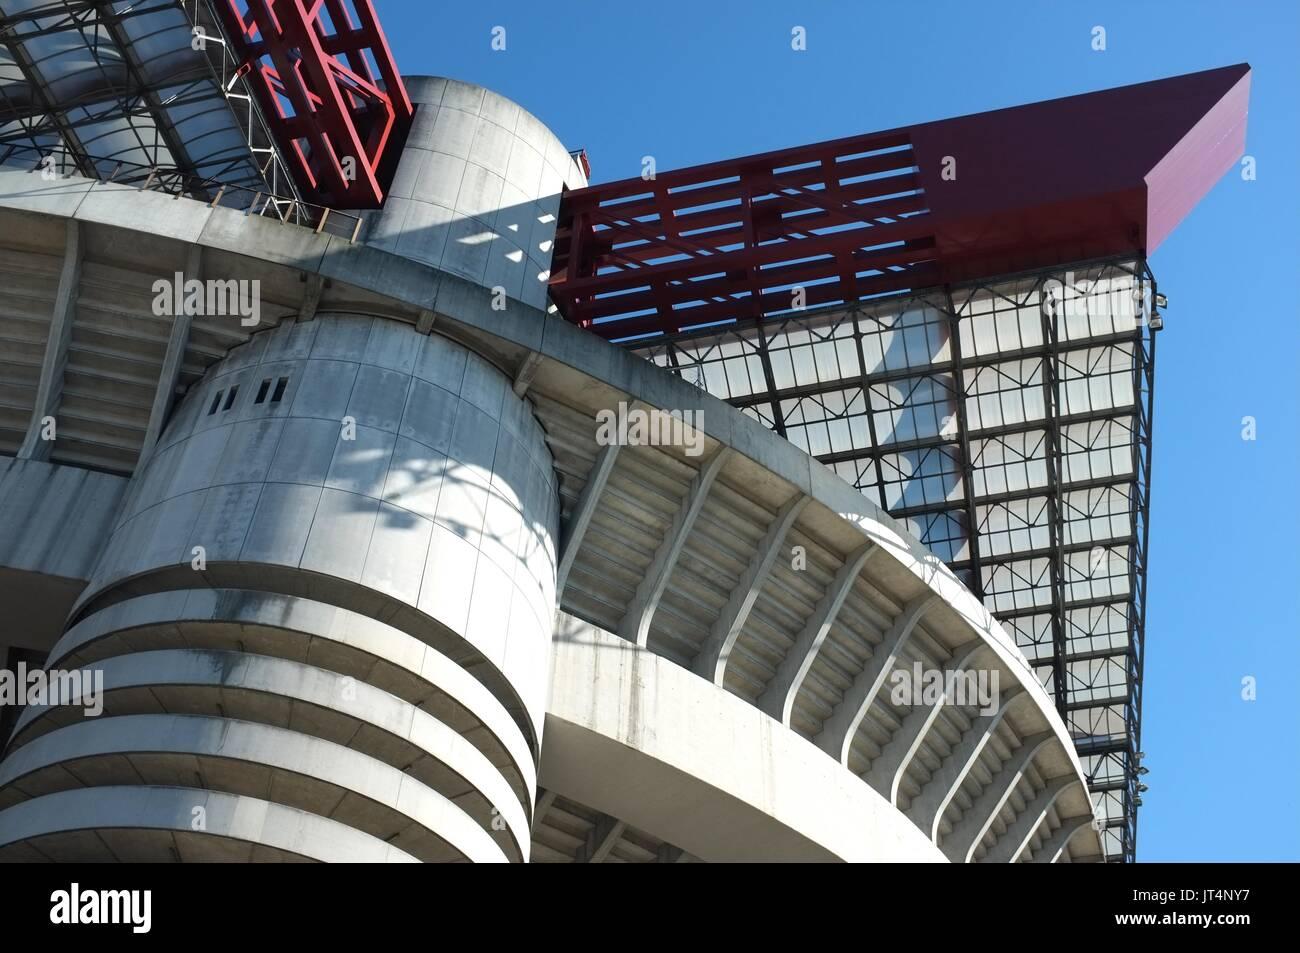 Exterior of the San Siro stadium, Milan, Lombardy, Italy, July 2017 - Stock Image